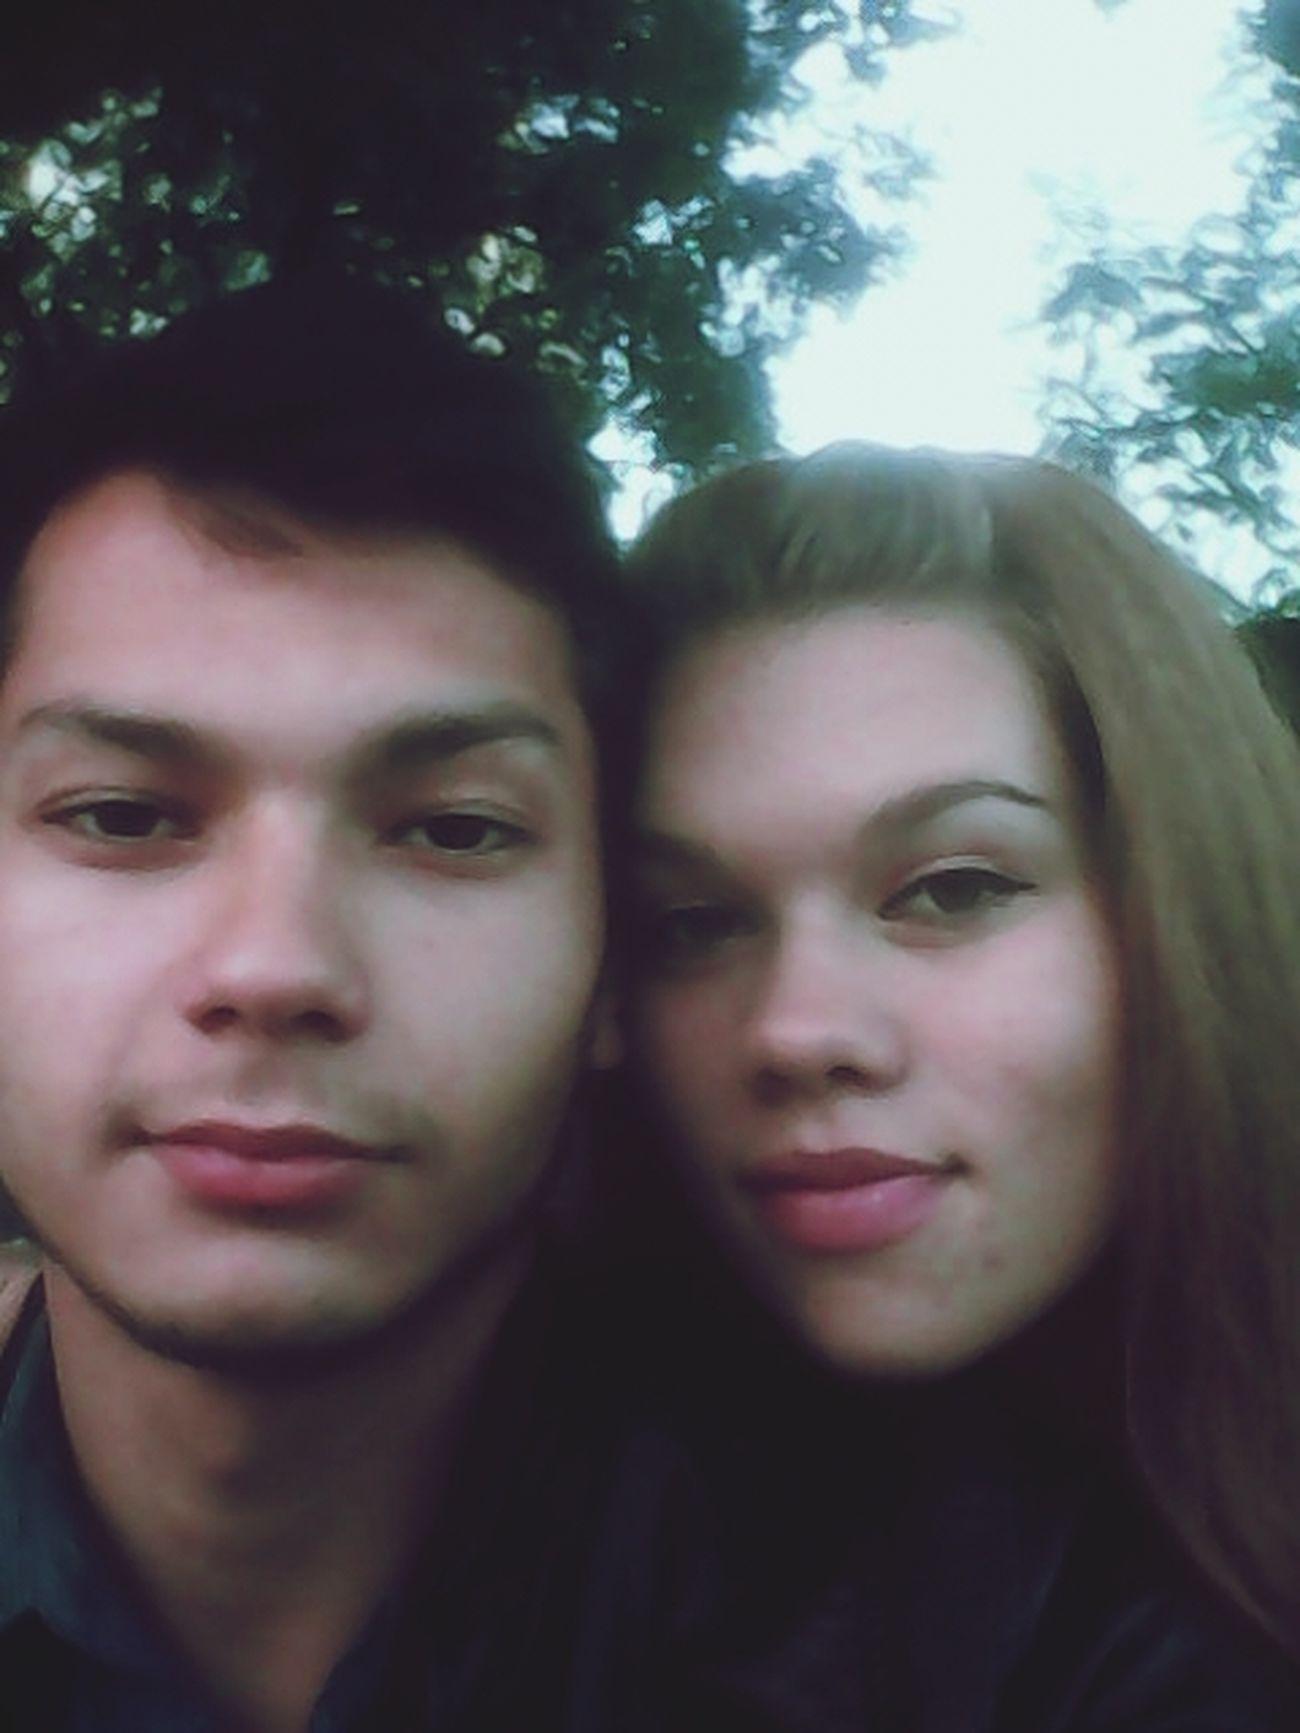 Love ♥ Amor ♥ Baby ❤ Married amo-te com tudooo! Ya kohayo tebe lhyubina! <3